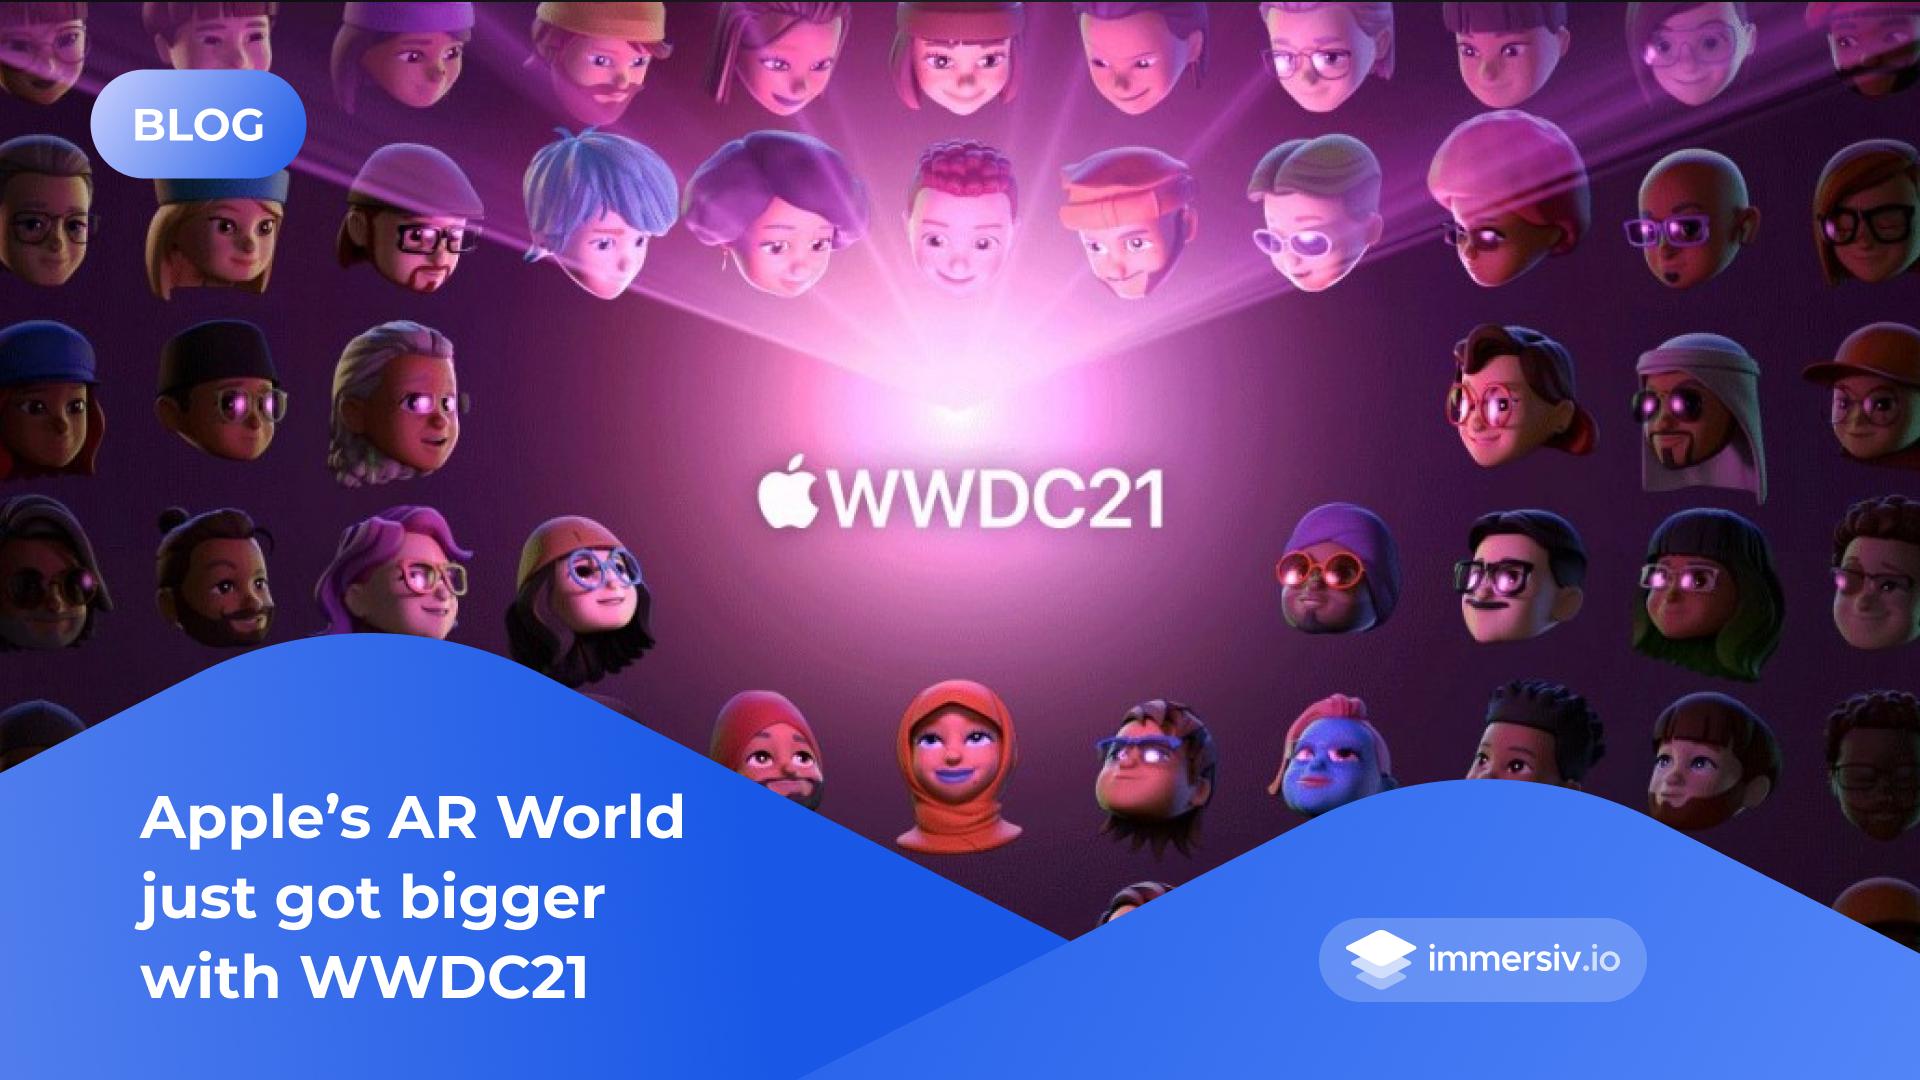 Apple WWDC 21 AR